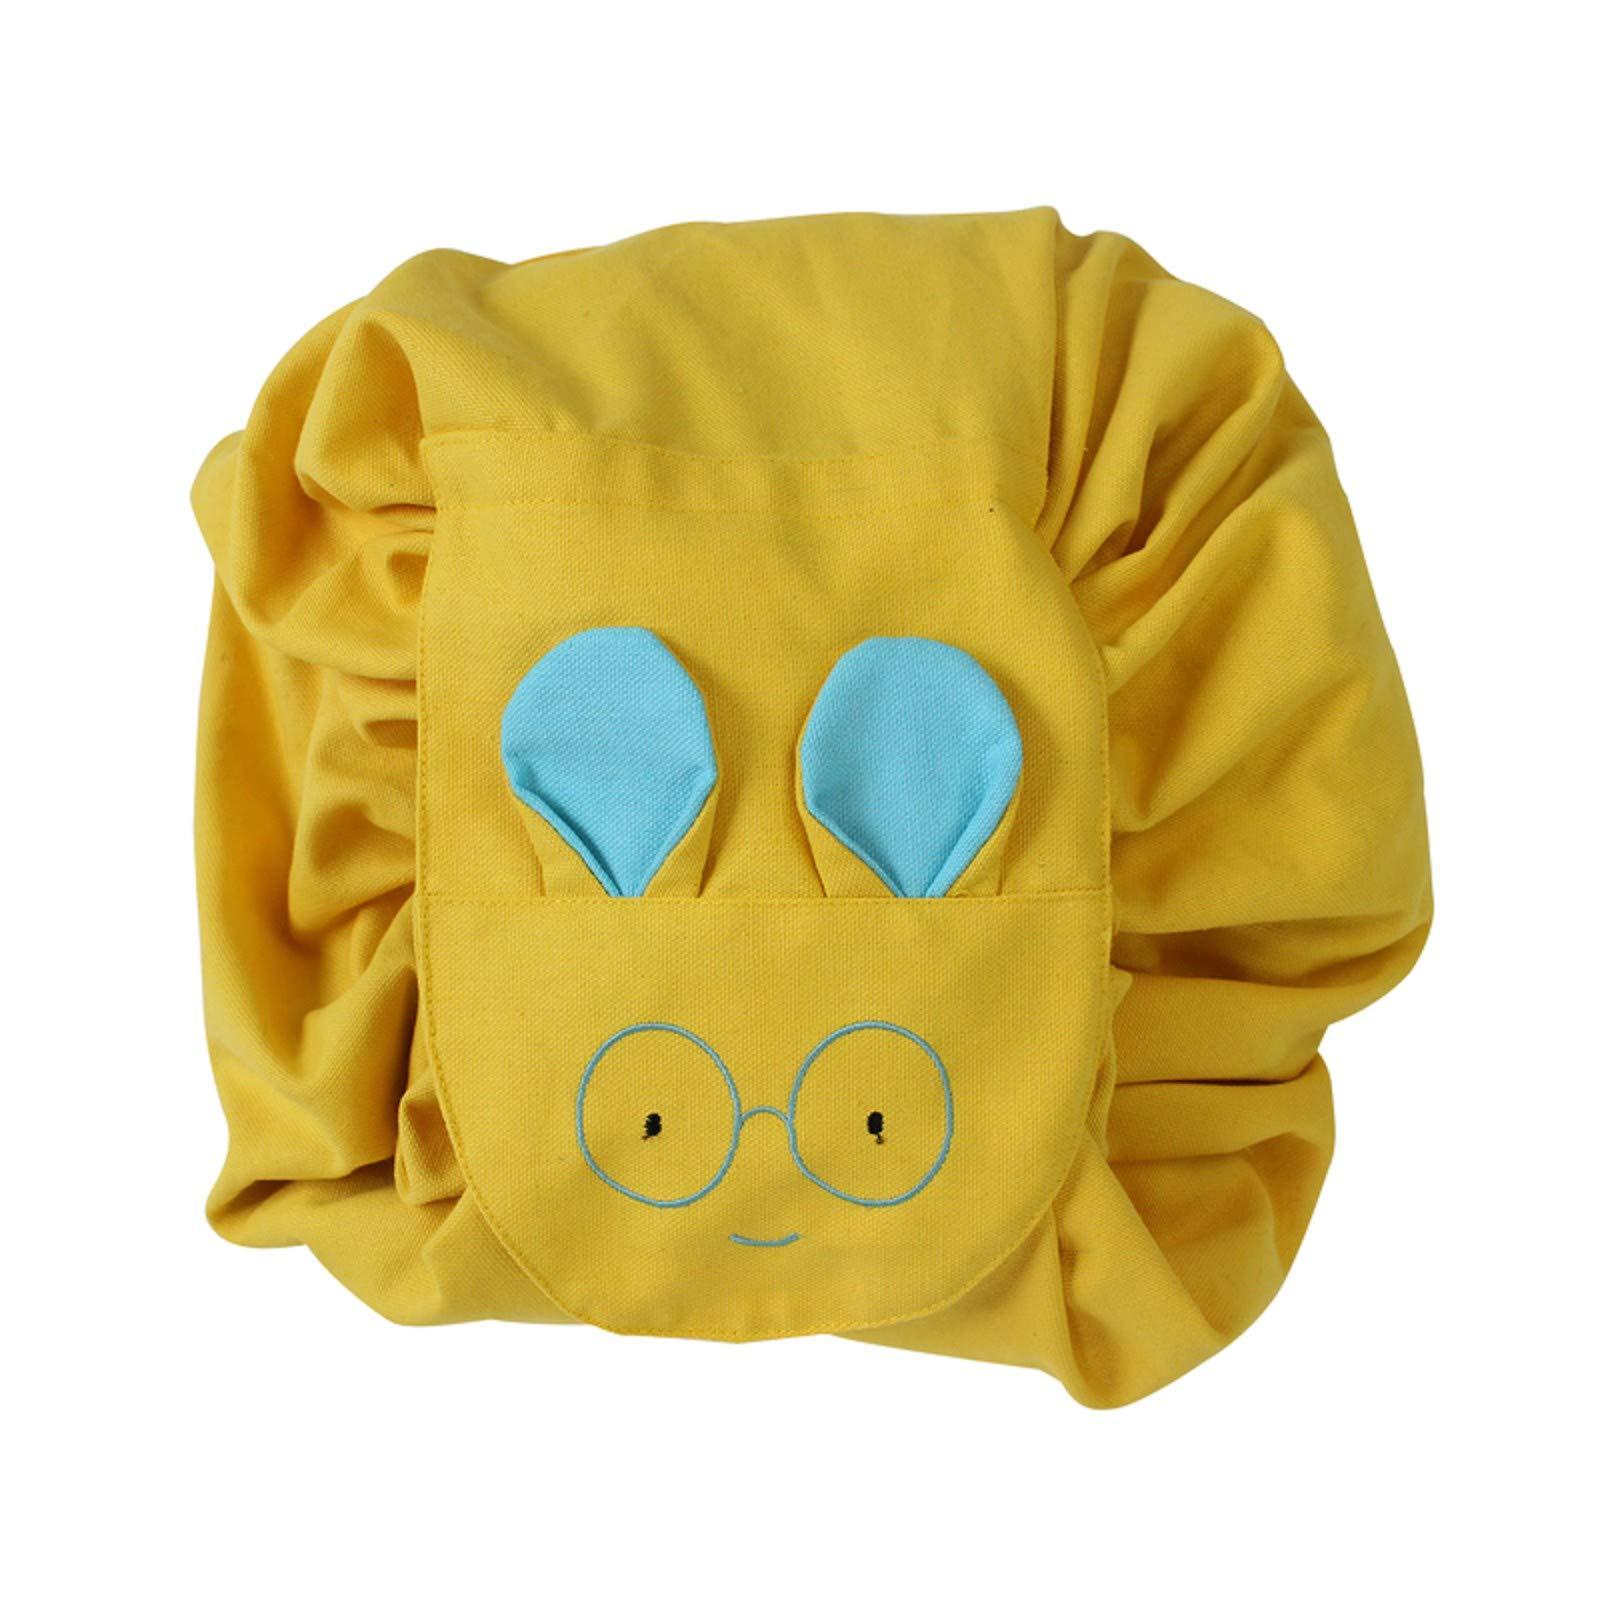 MZS Tec Kids Toys Storage Bag, Foldable Drawstring Plush Animal Stuffed Toys Bag Home Organizer Bulk Accessories (L, A Yellow)